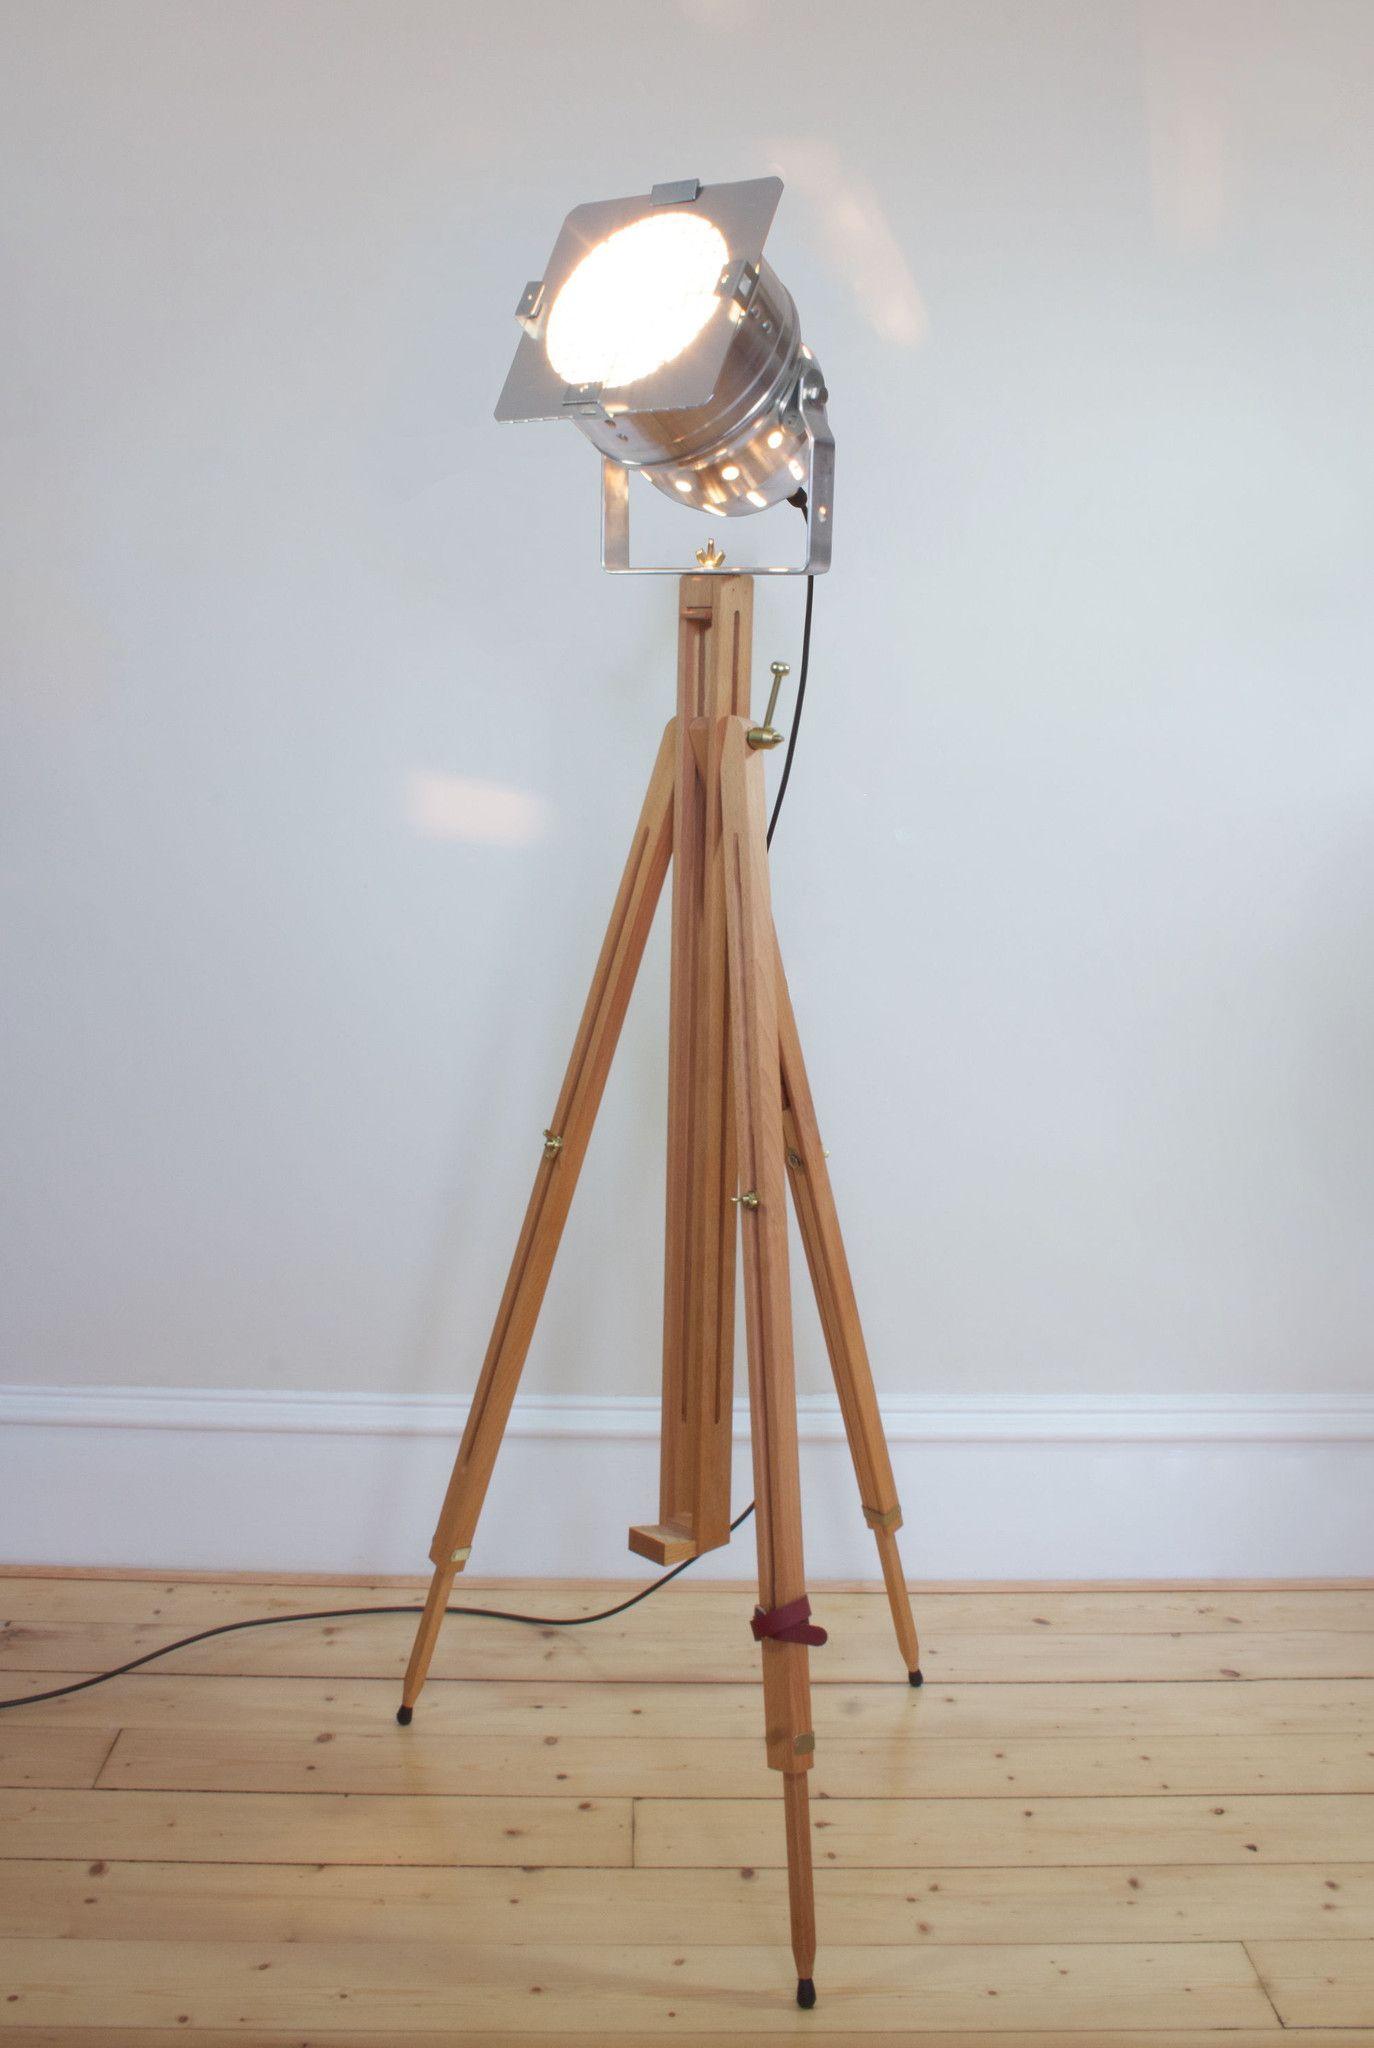 Vintage Retro Theatre Spot Light Tripod Floor Lamp